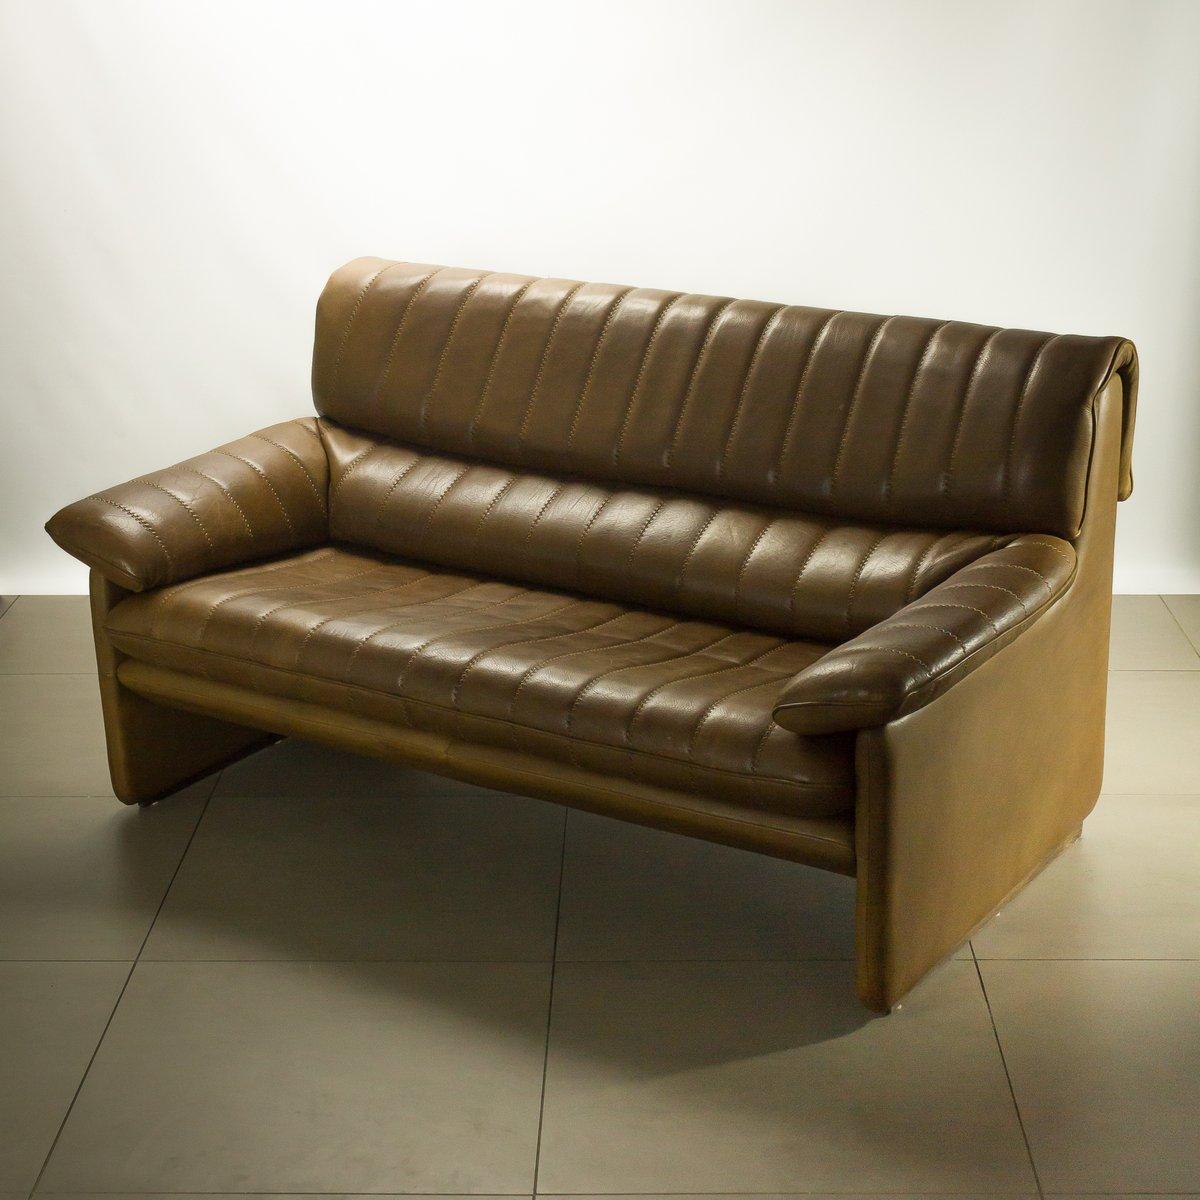 Ds 85 zwei sitzer sofa aus braunem leder von de sede bei for Sofa aus leder